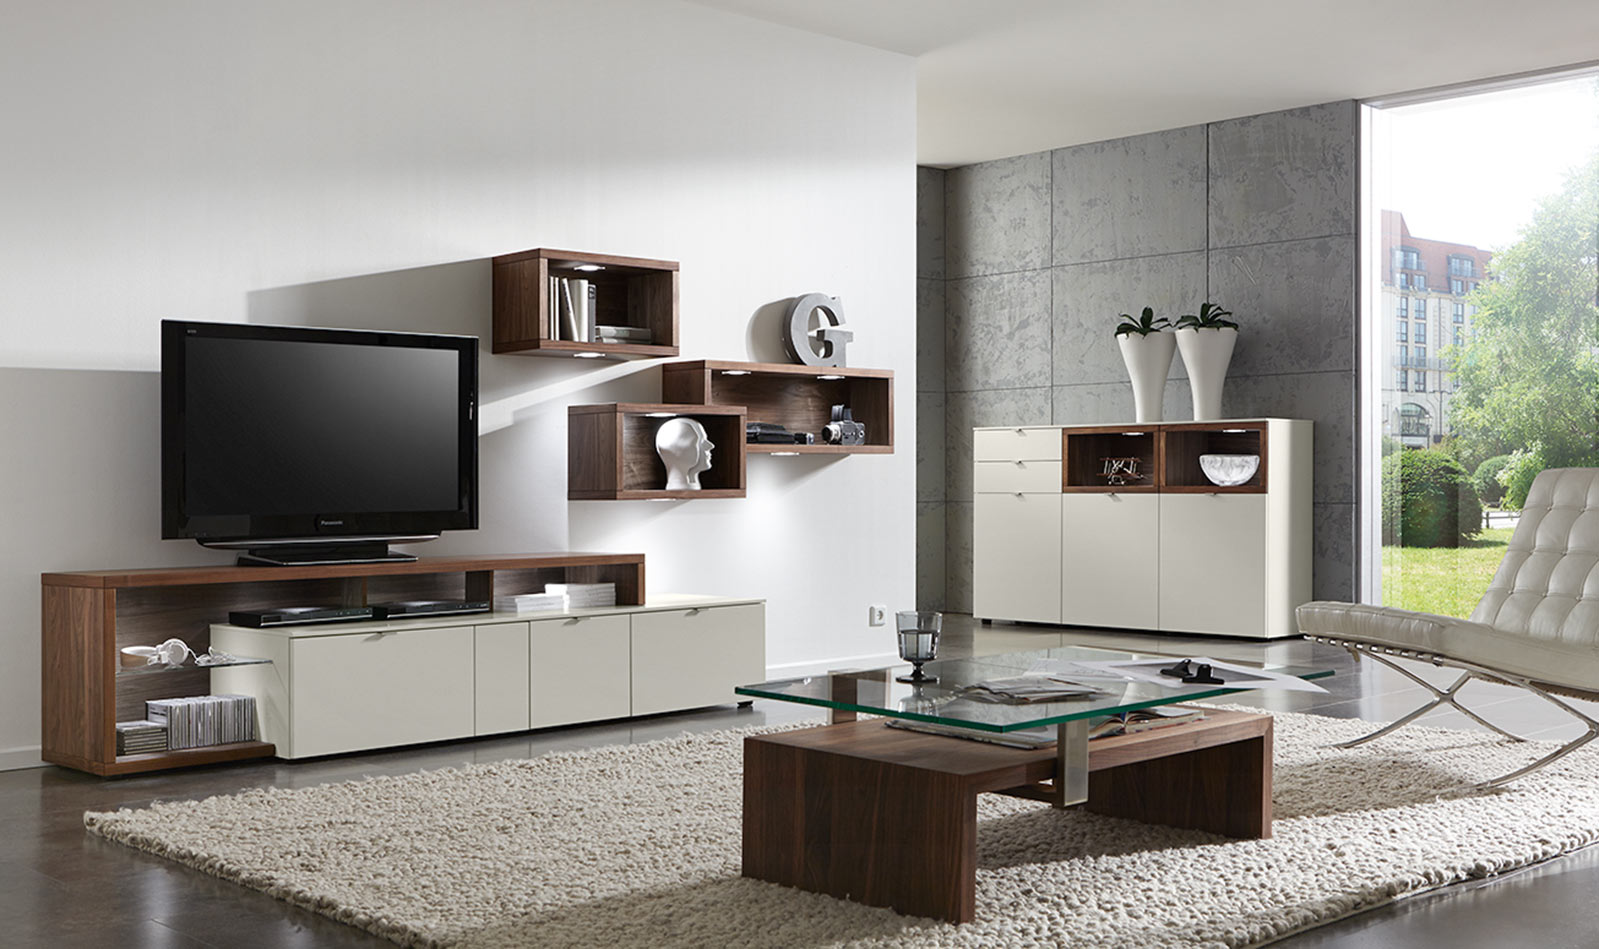 andiamo programme wohnzimmer venjakob m bel. Black Bedroom Furniture Sets. Home Design Ideas